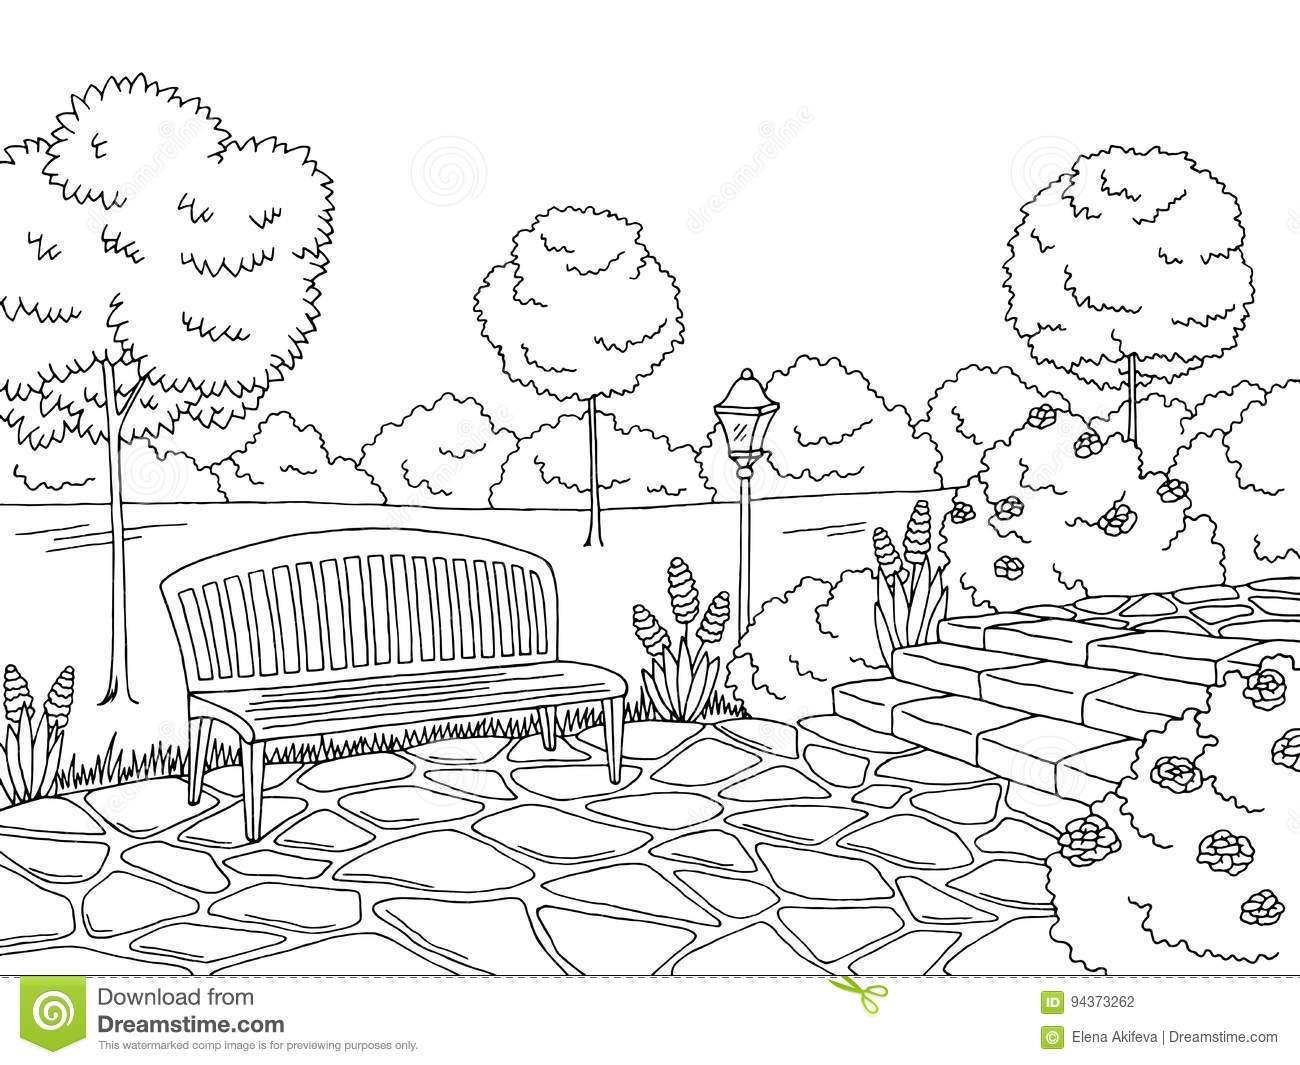 Park black and white clipart jpg black and white stock Clipart park black and white 5 » Clipart Portal jpg black and white stock